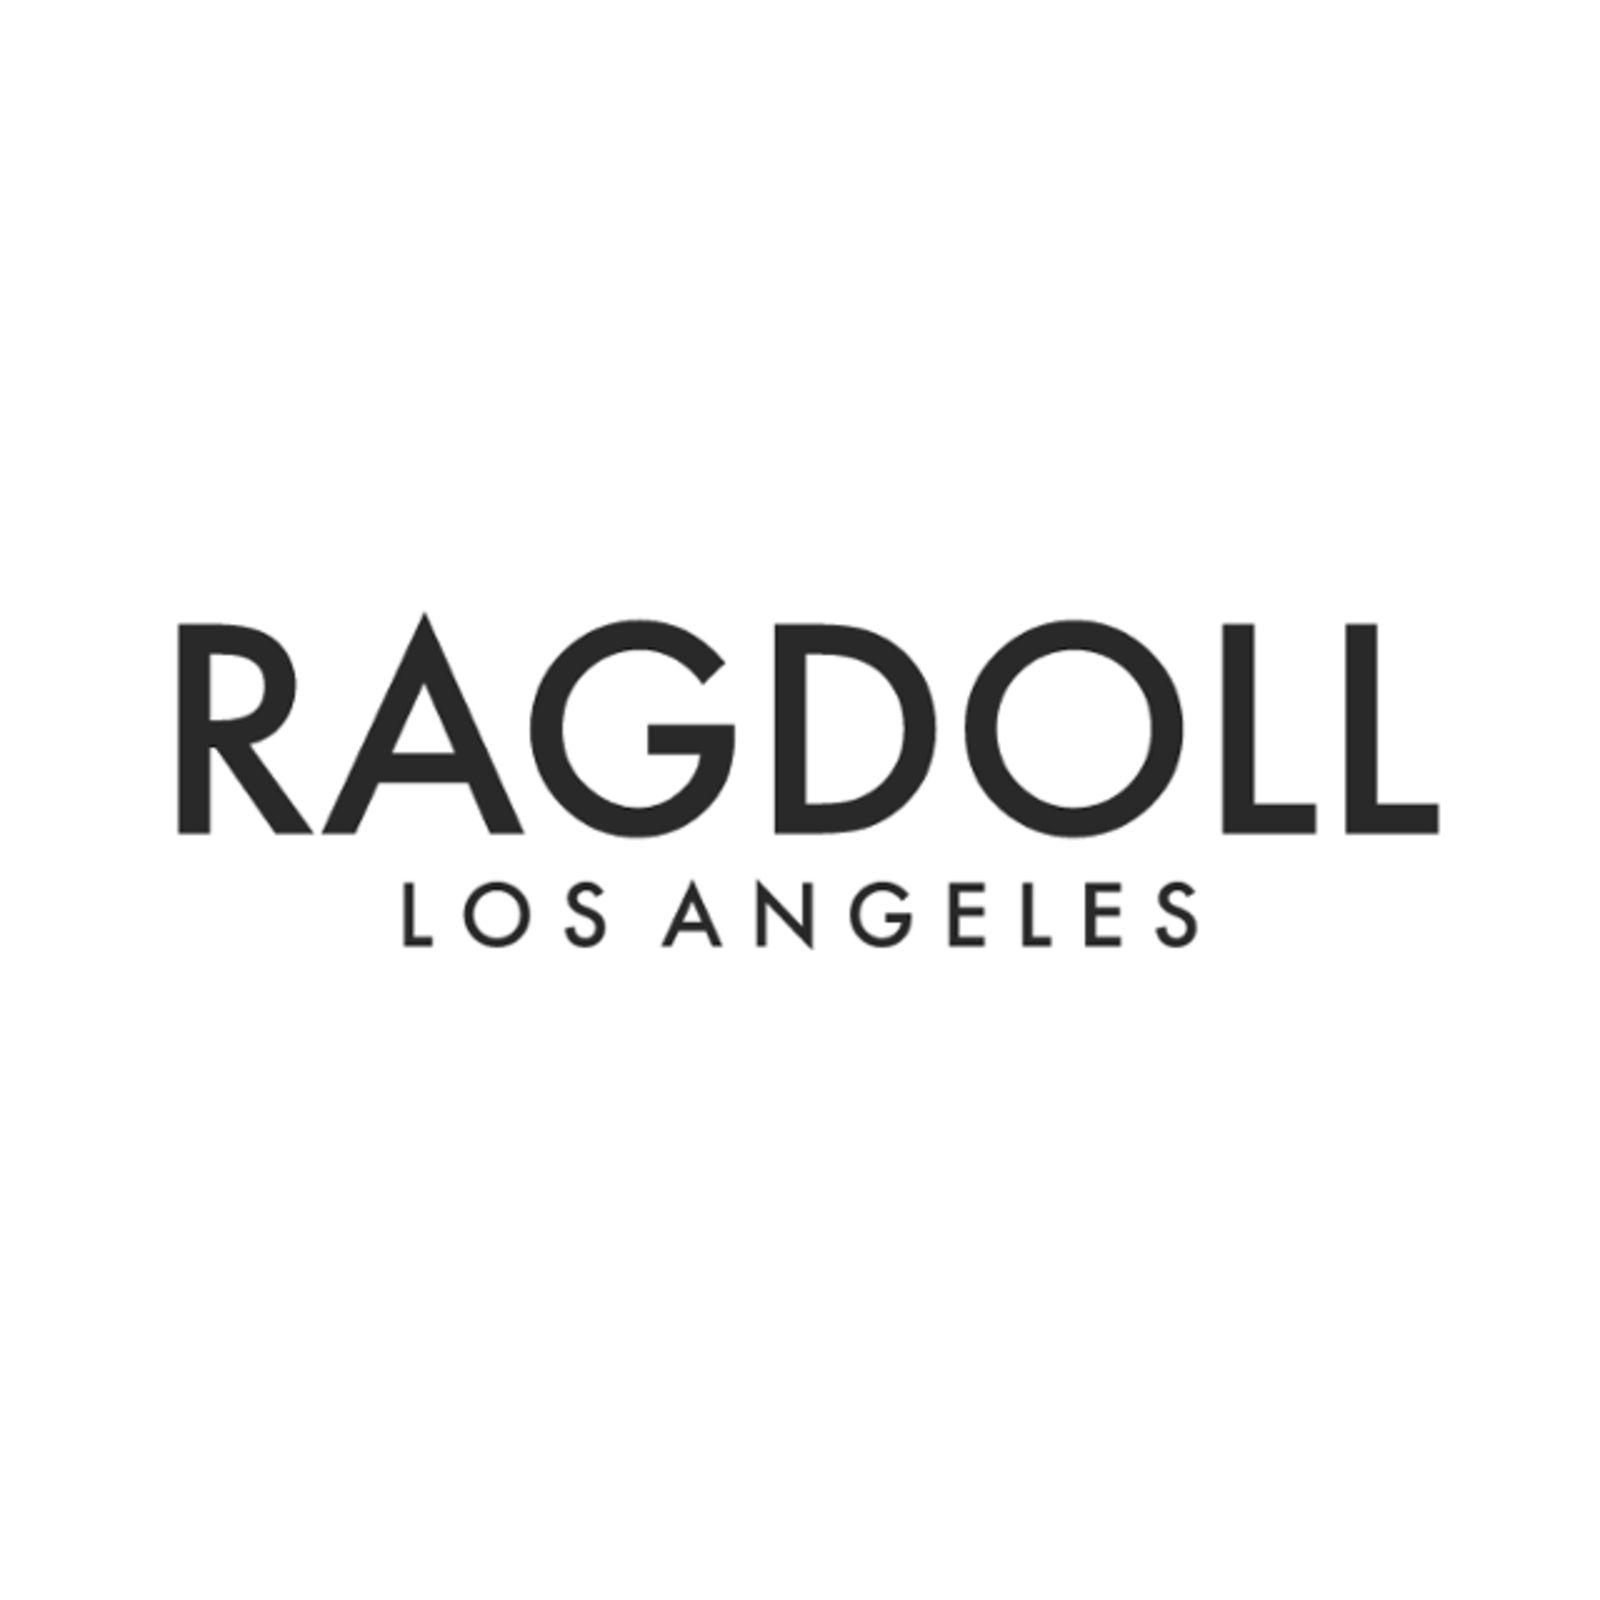 RAGDOLL LA (Bild 1)